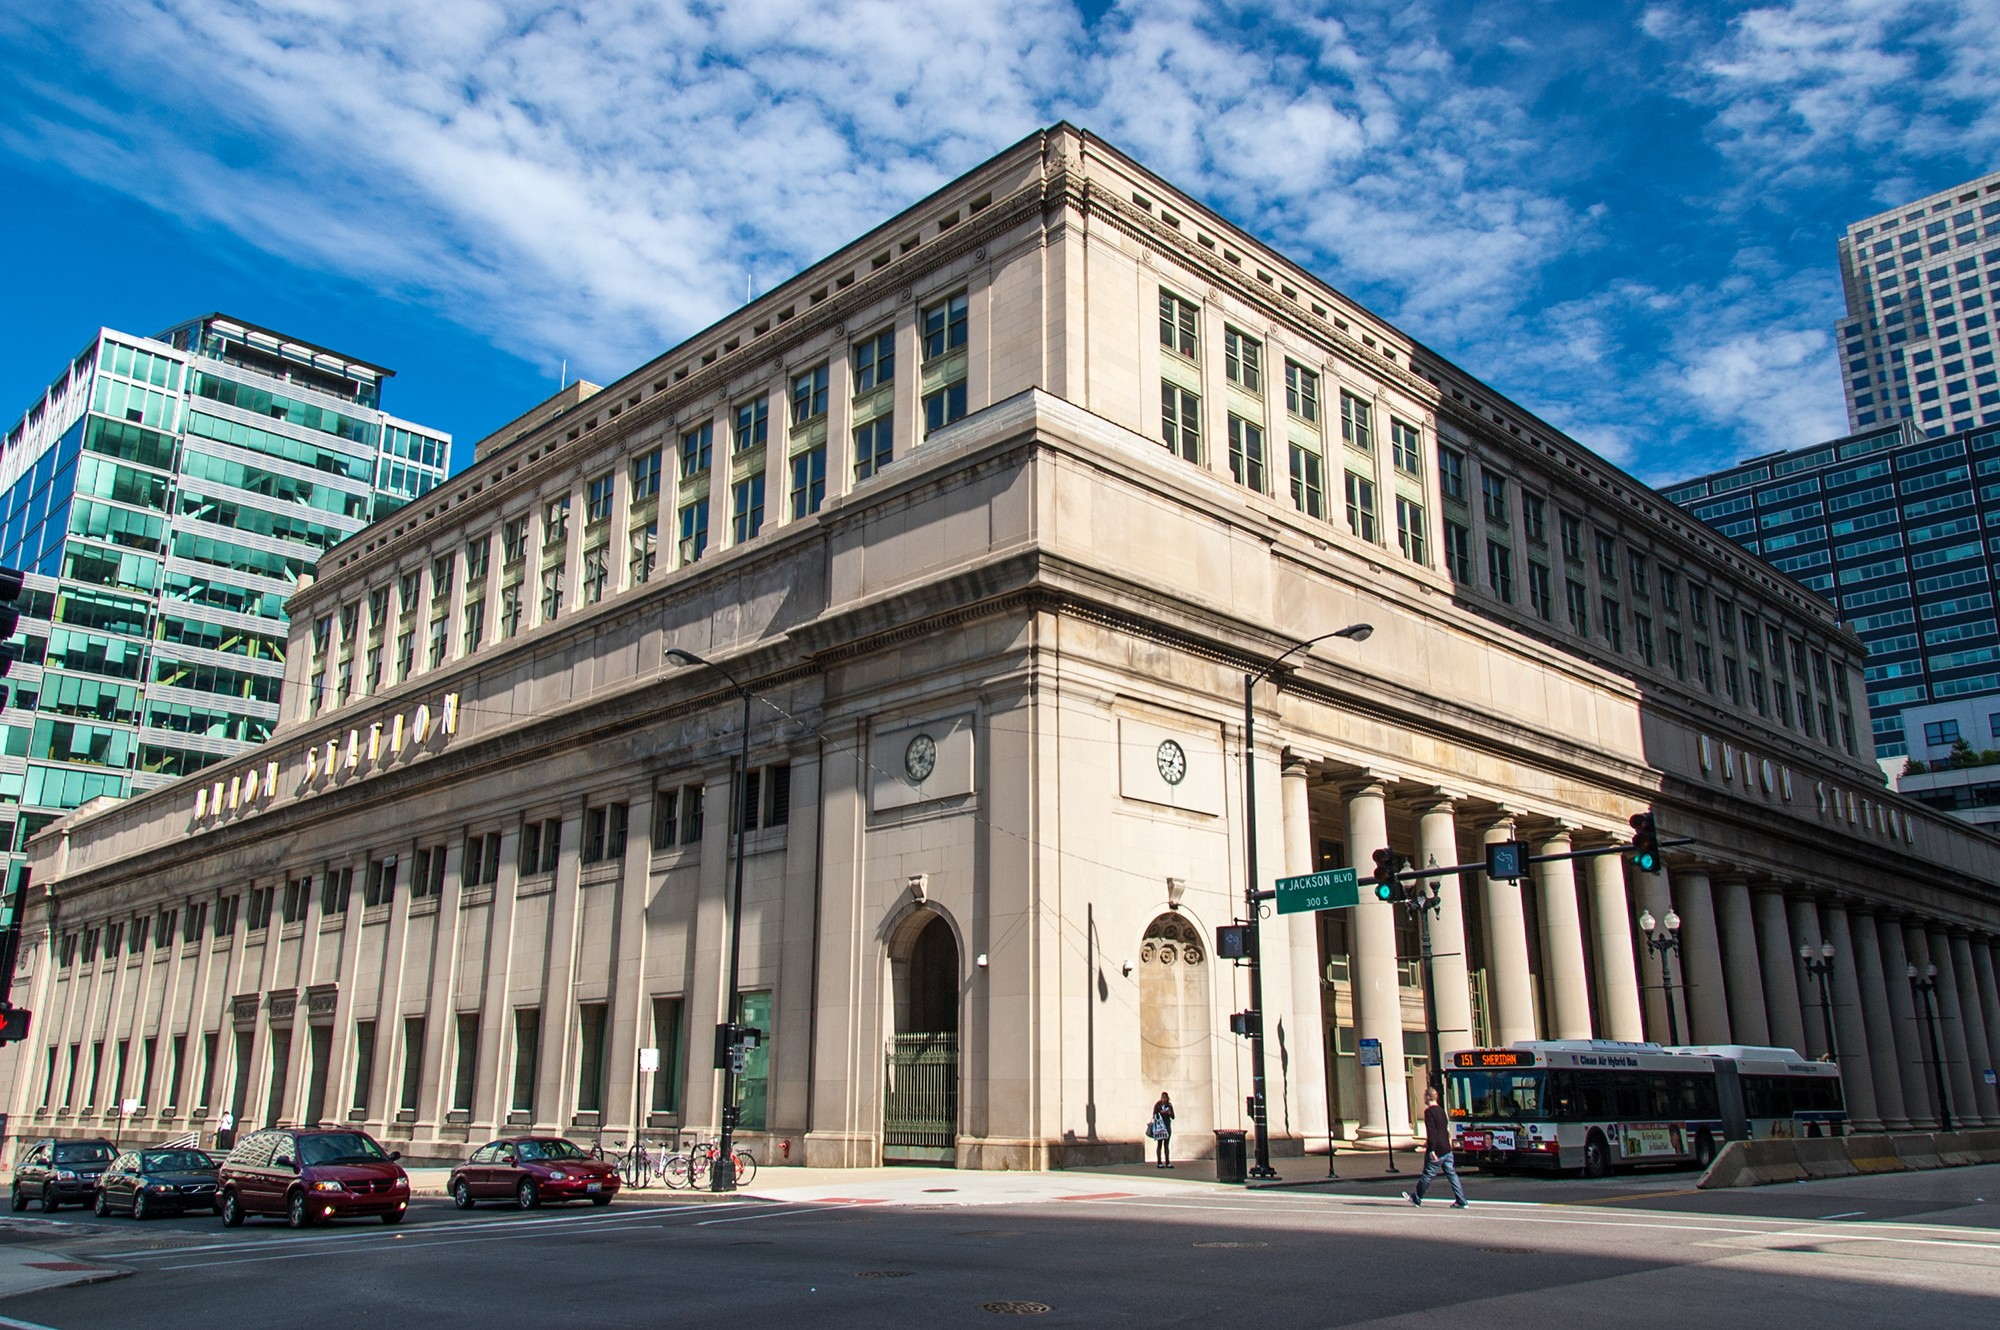 Michigan Central Station Detroit Mi Sept 13 2017